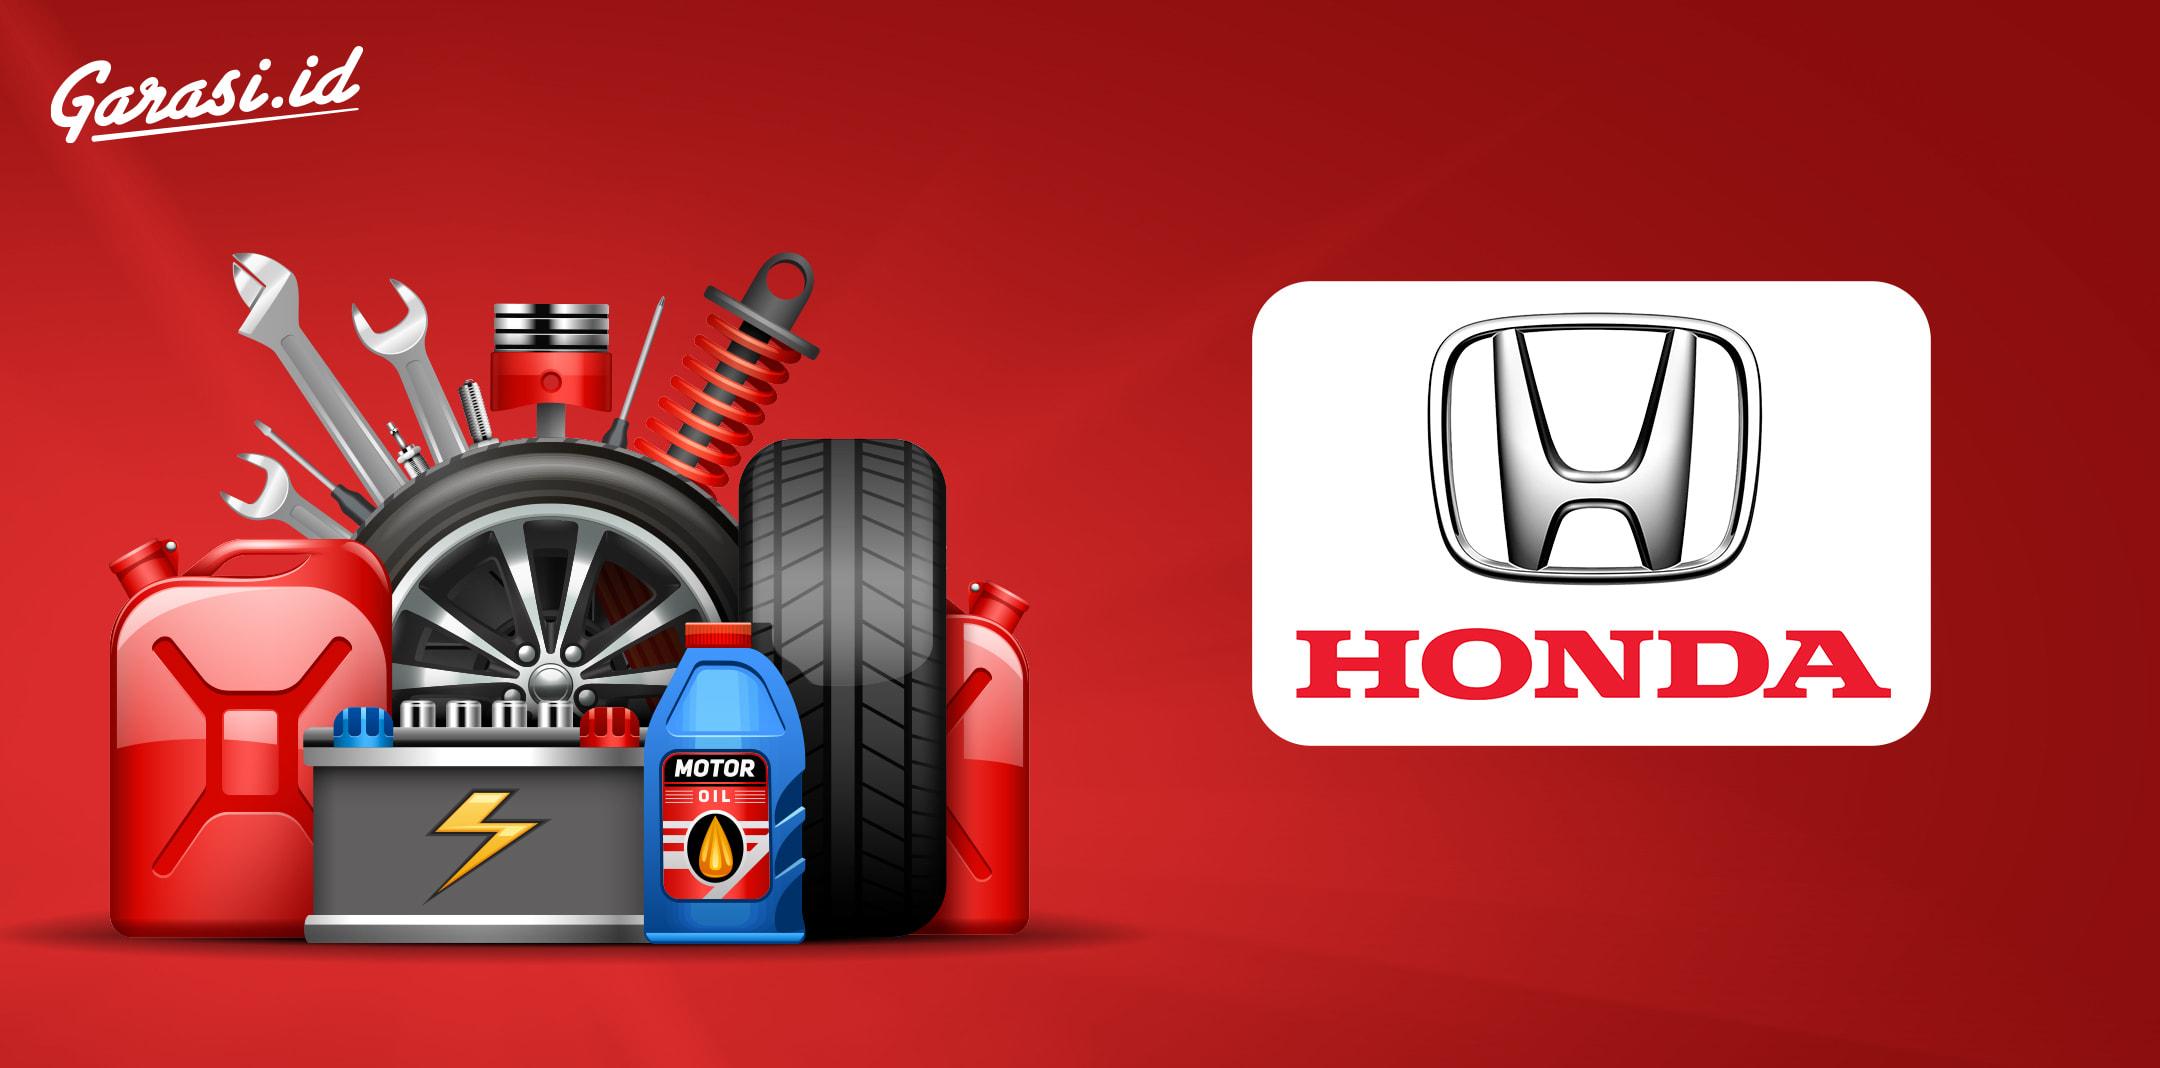 Honda Bintang (Tangerang)